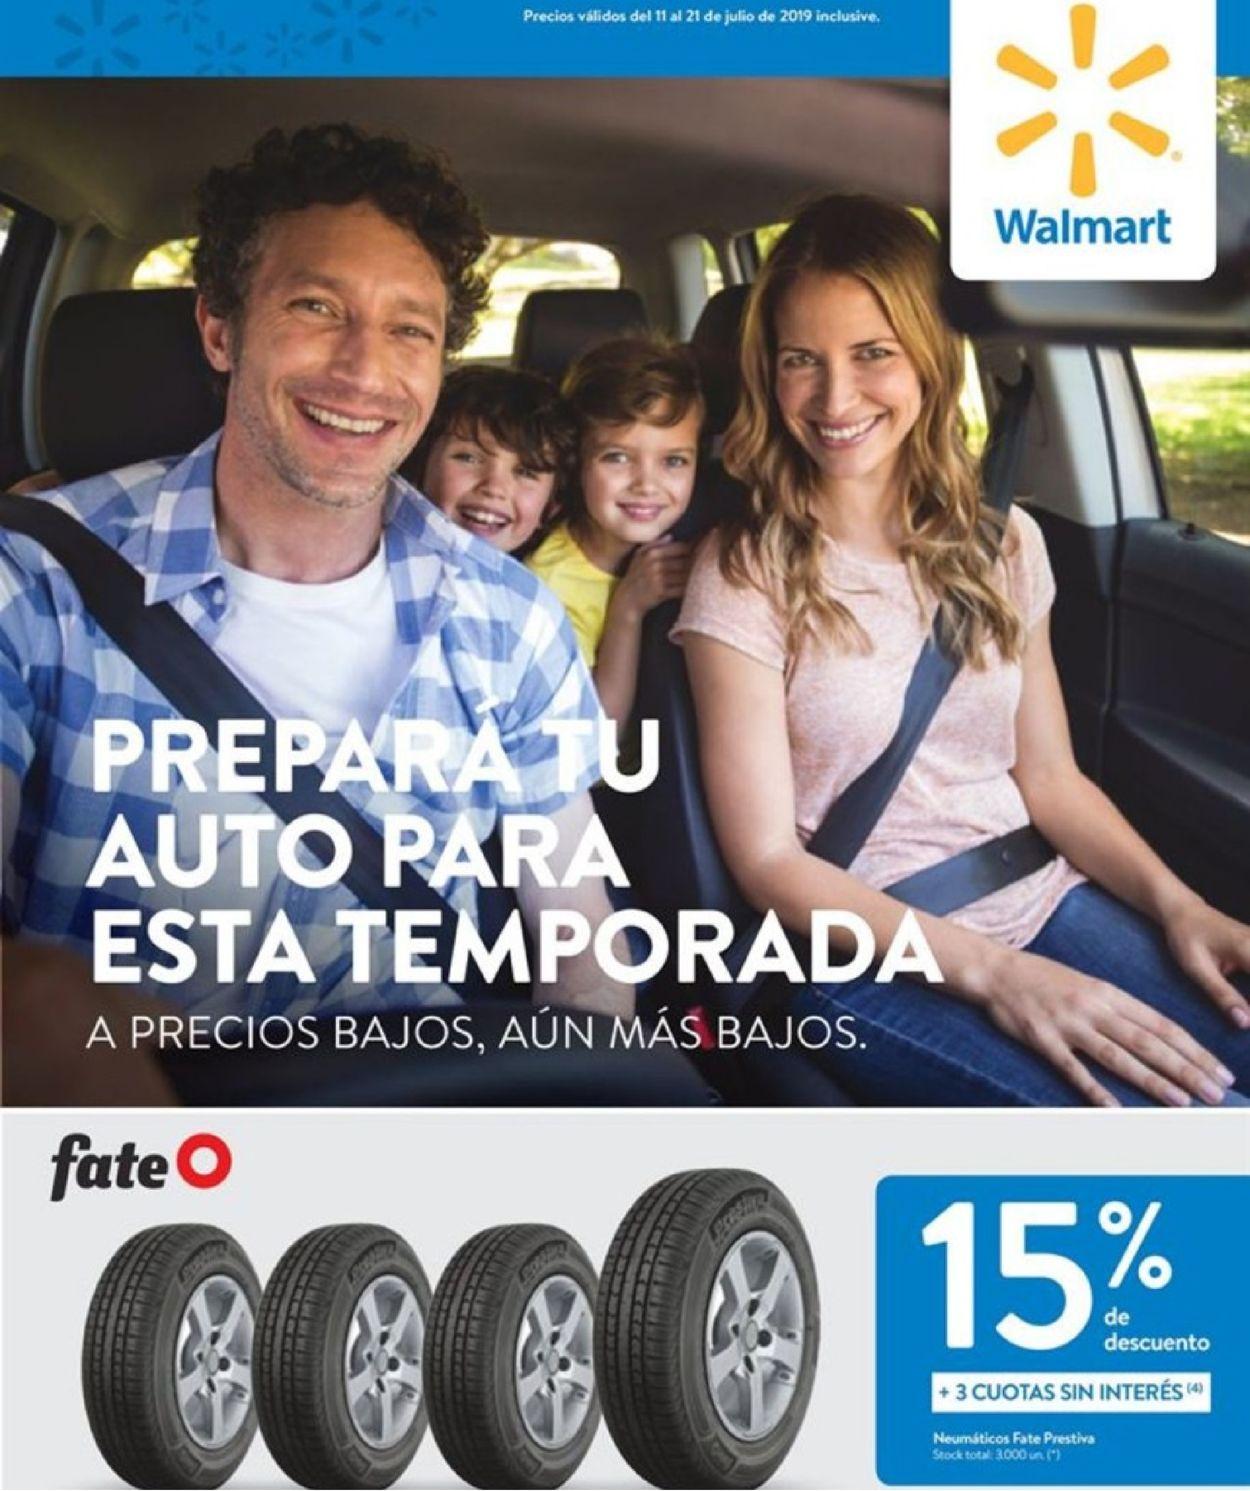 Walmart Folleto - 11.07-21.07.2019